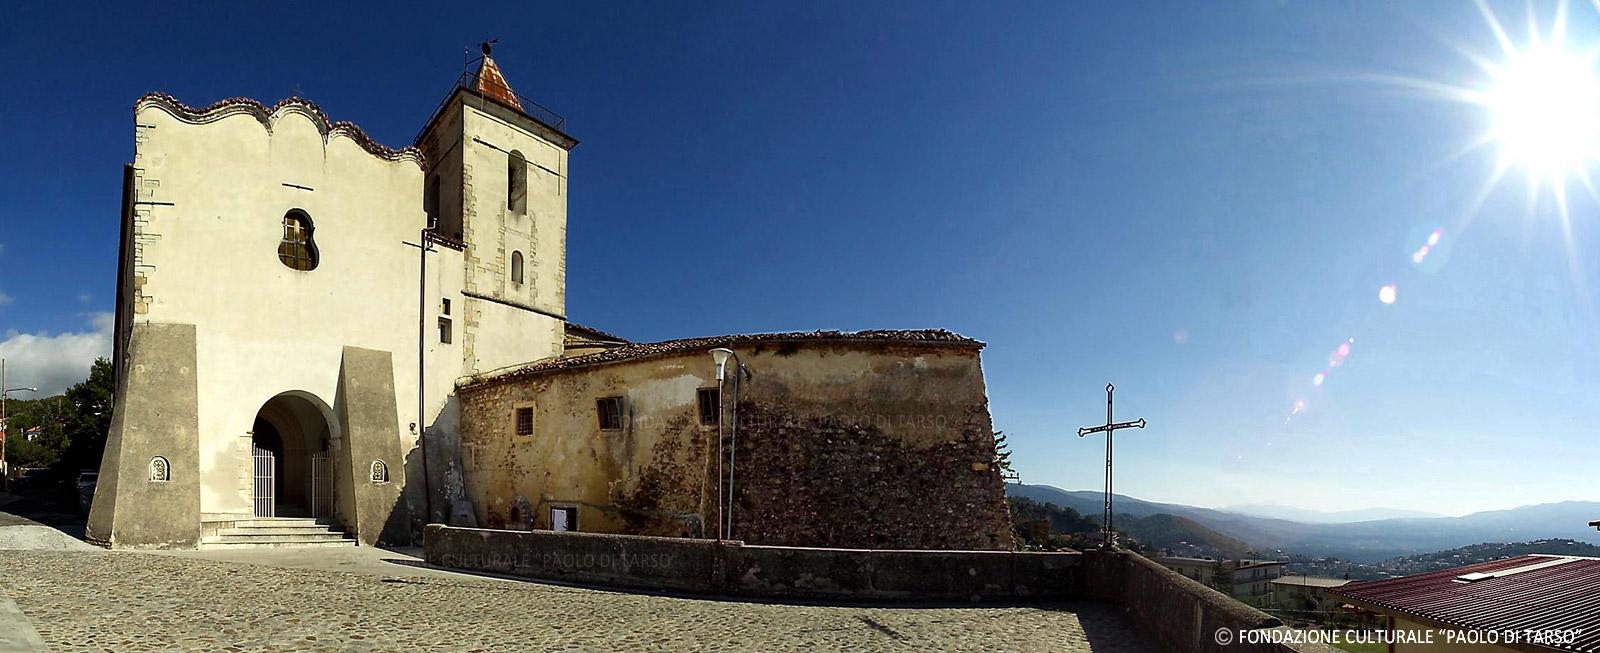 Convento di San Francesco di Paola